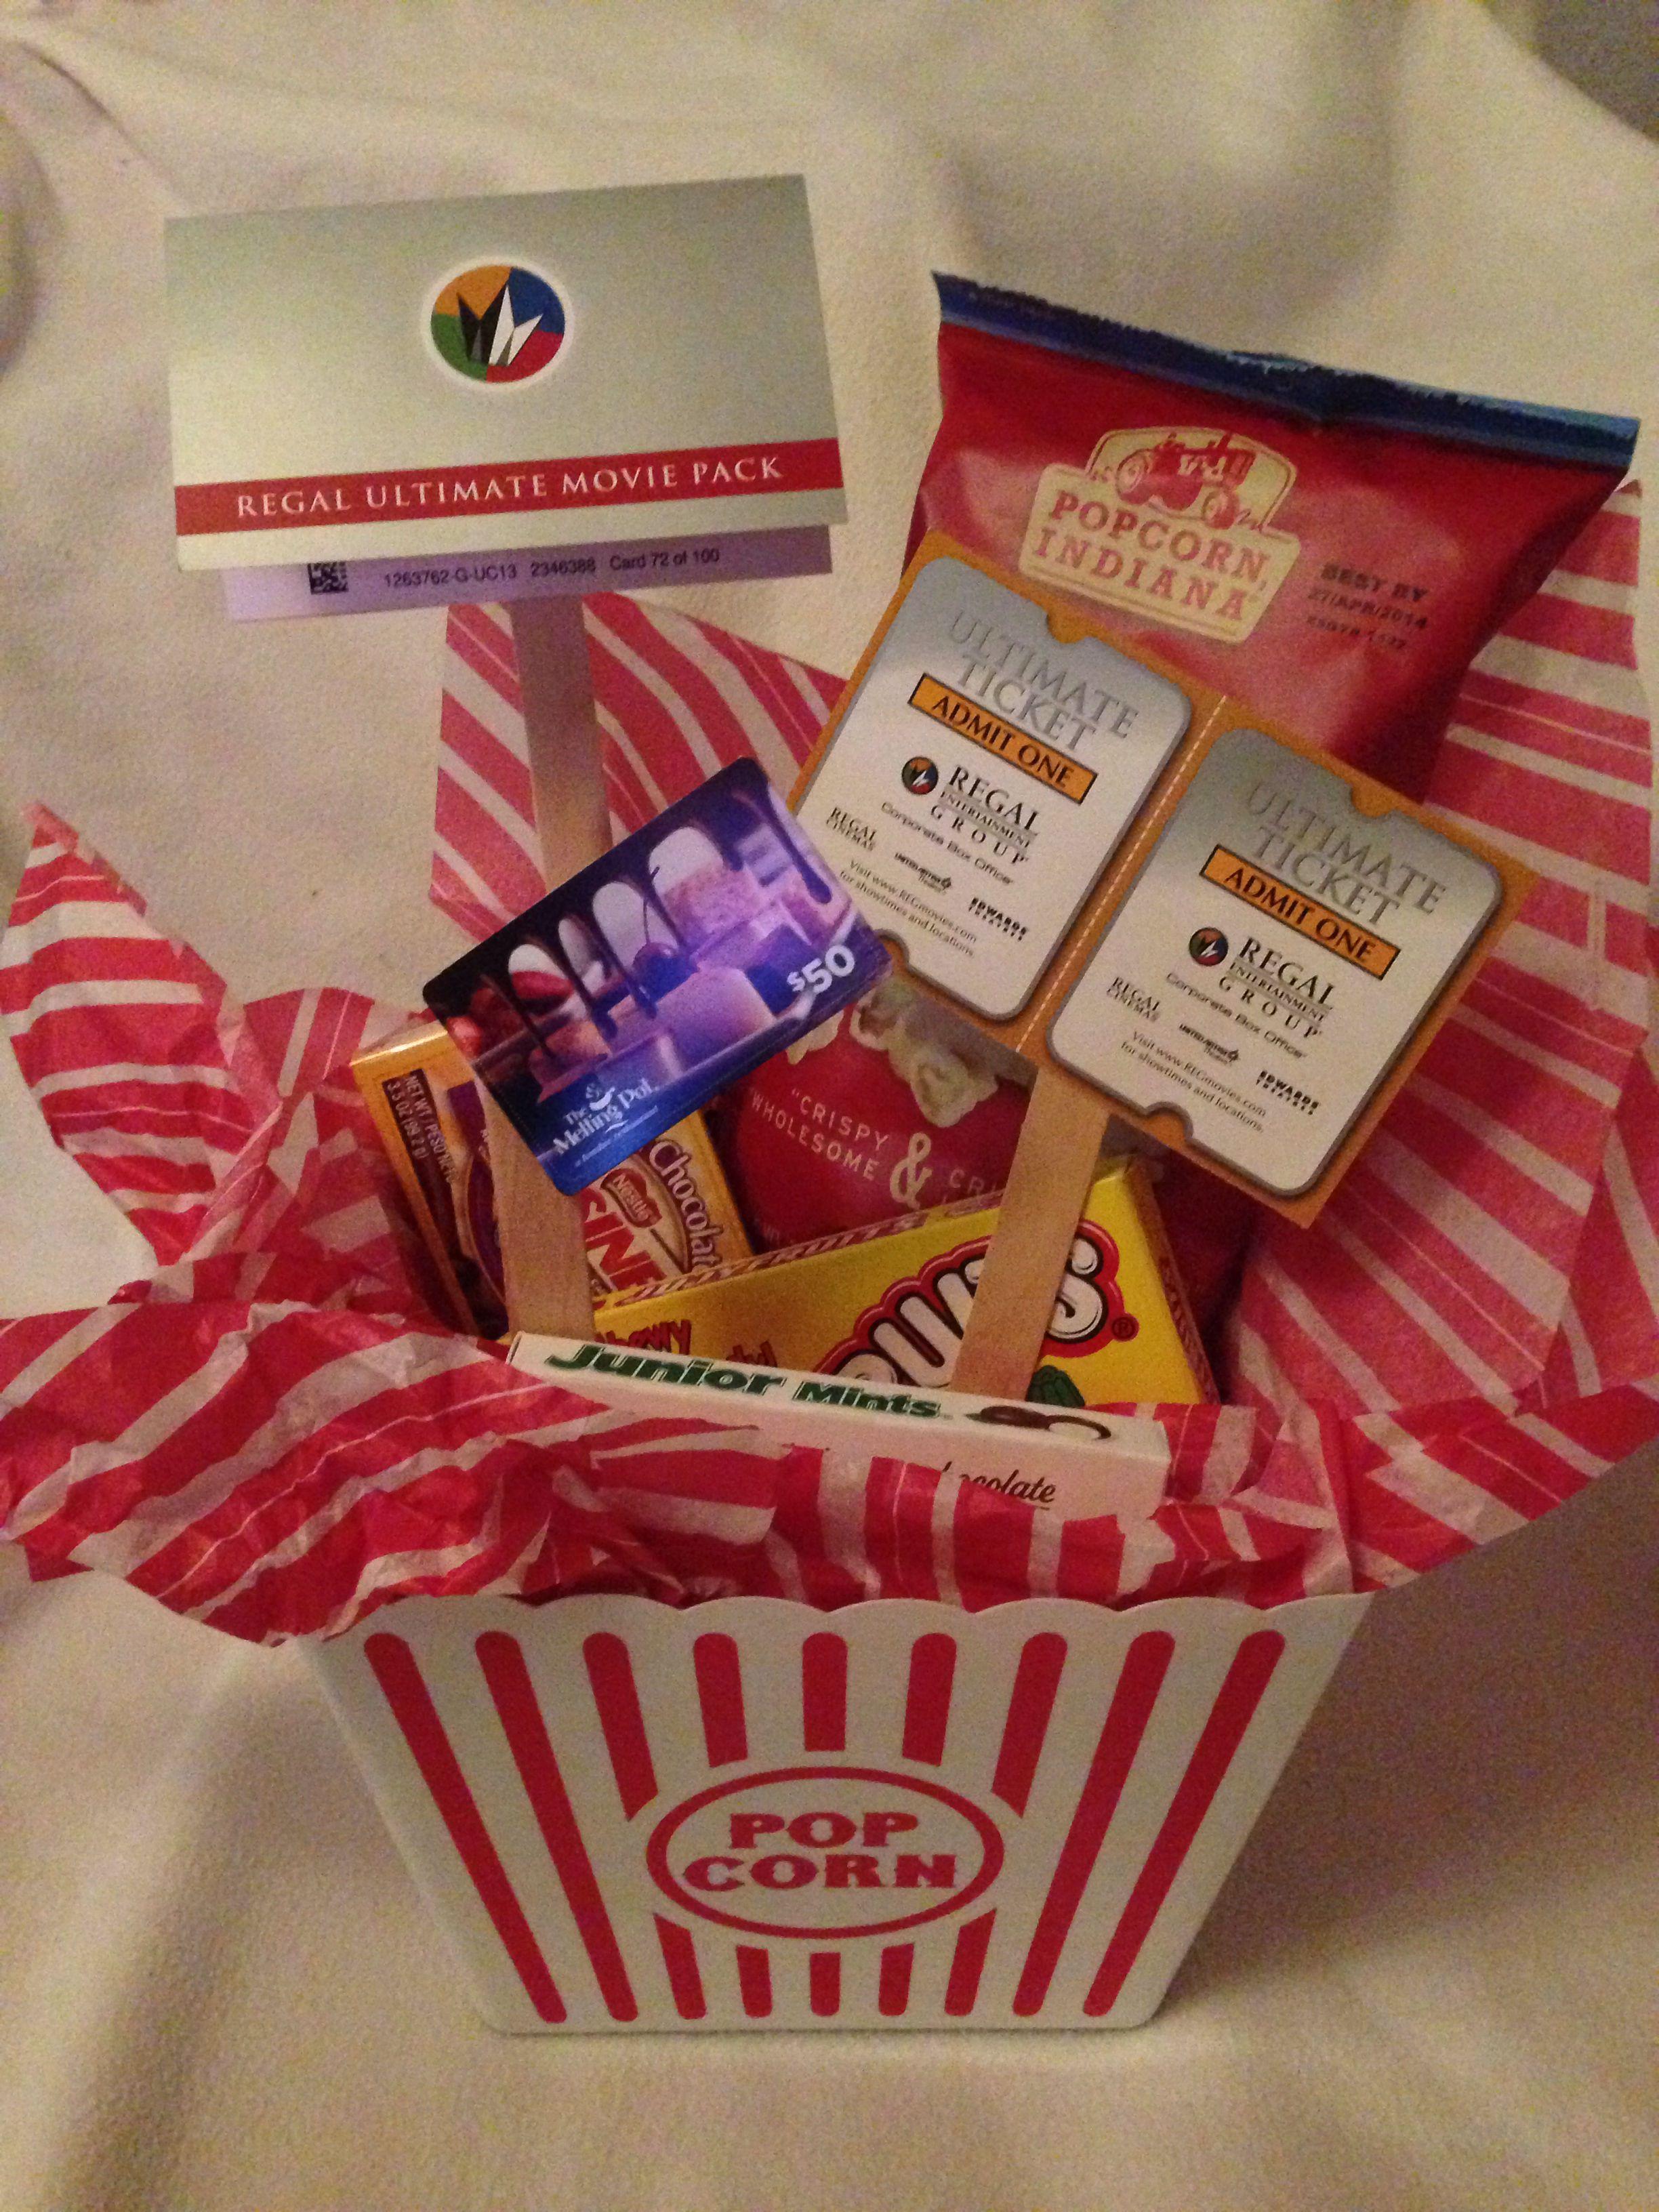 Dinner A Movie Gift Movie Theater Snacks Bag Of Popcorn Dinner